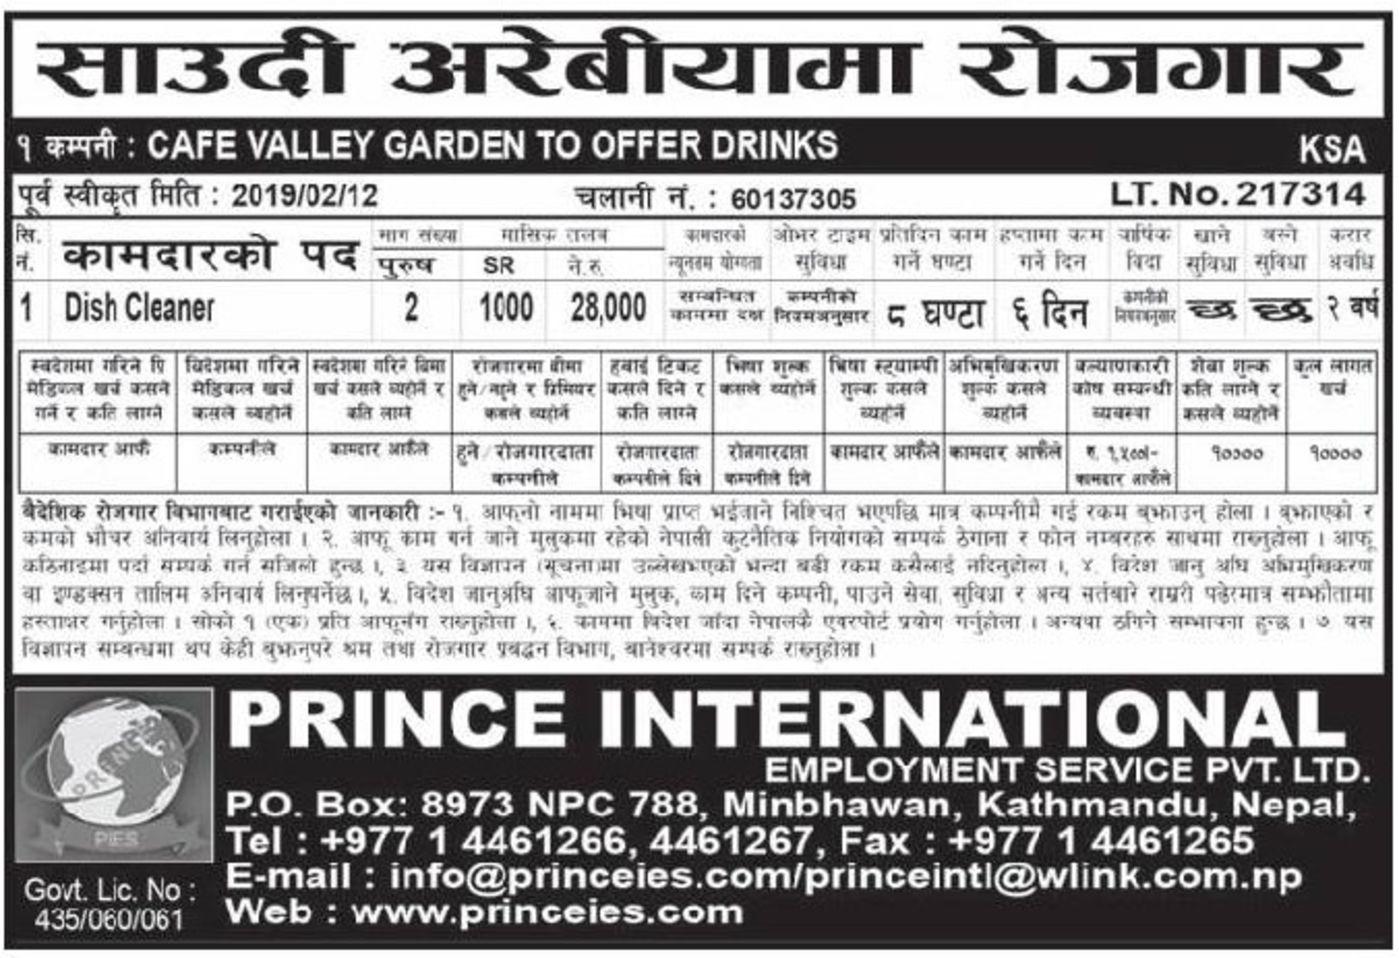 Jobs Nepal - Vacancy - Dish Cleaner - Cafe Valley Garden To